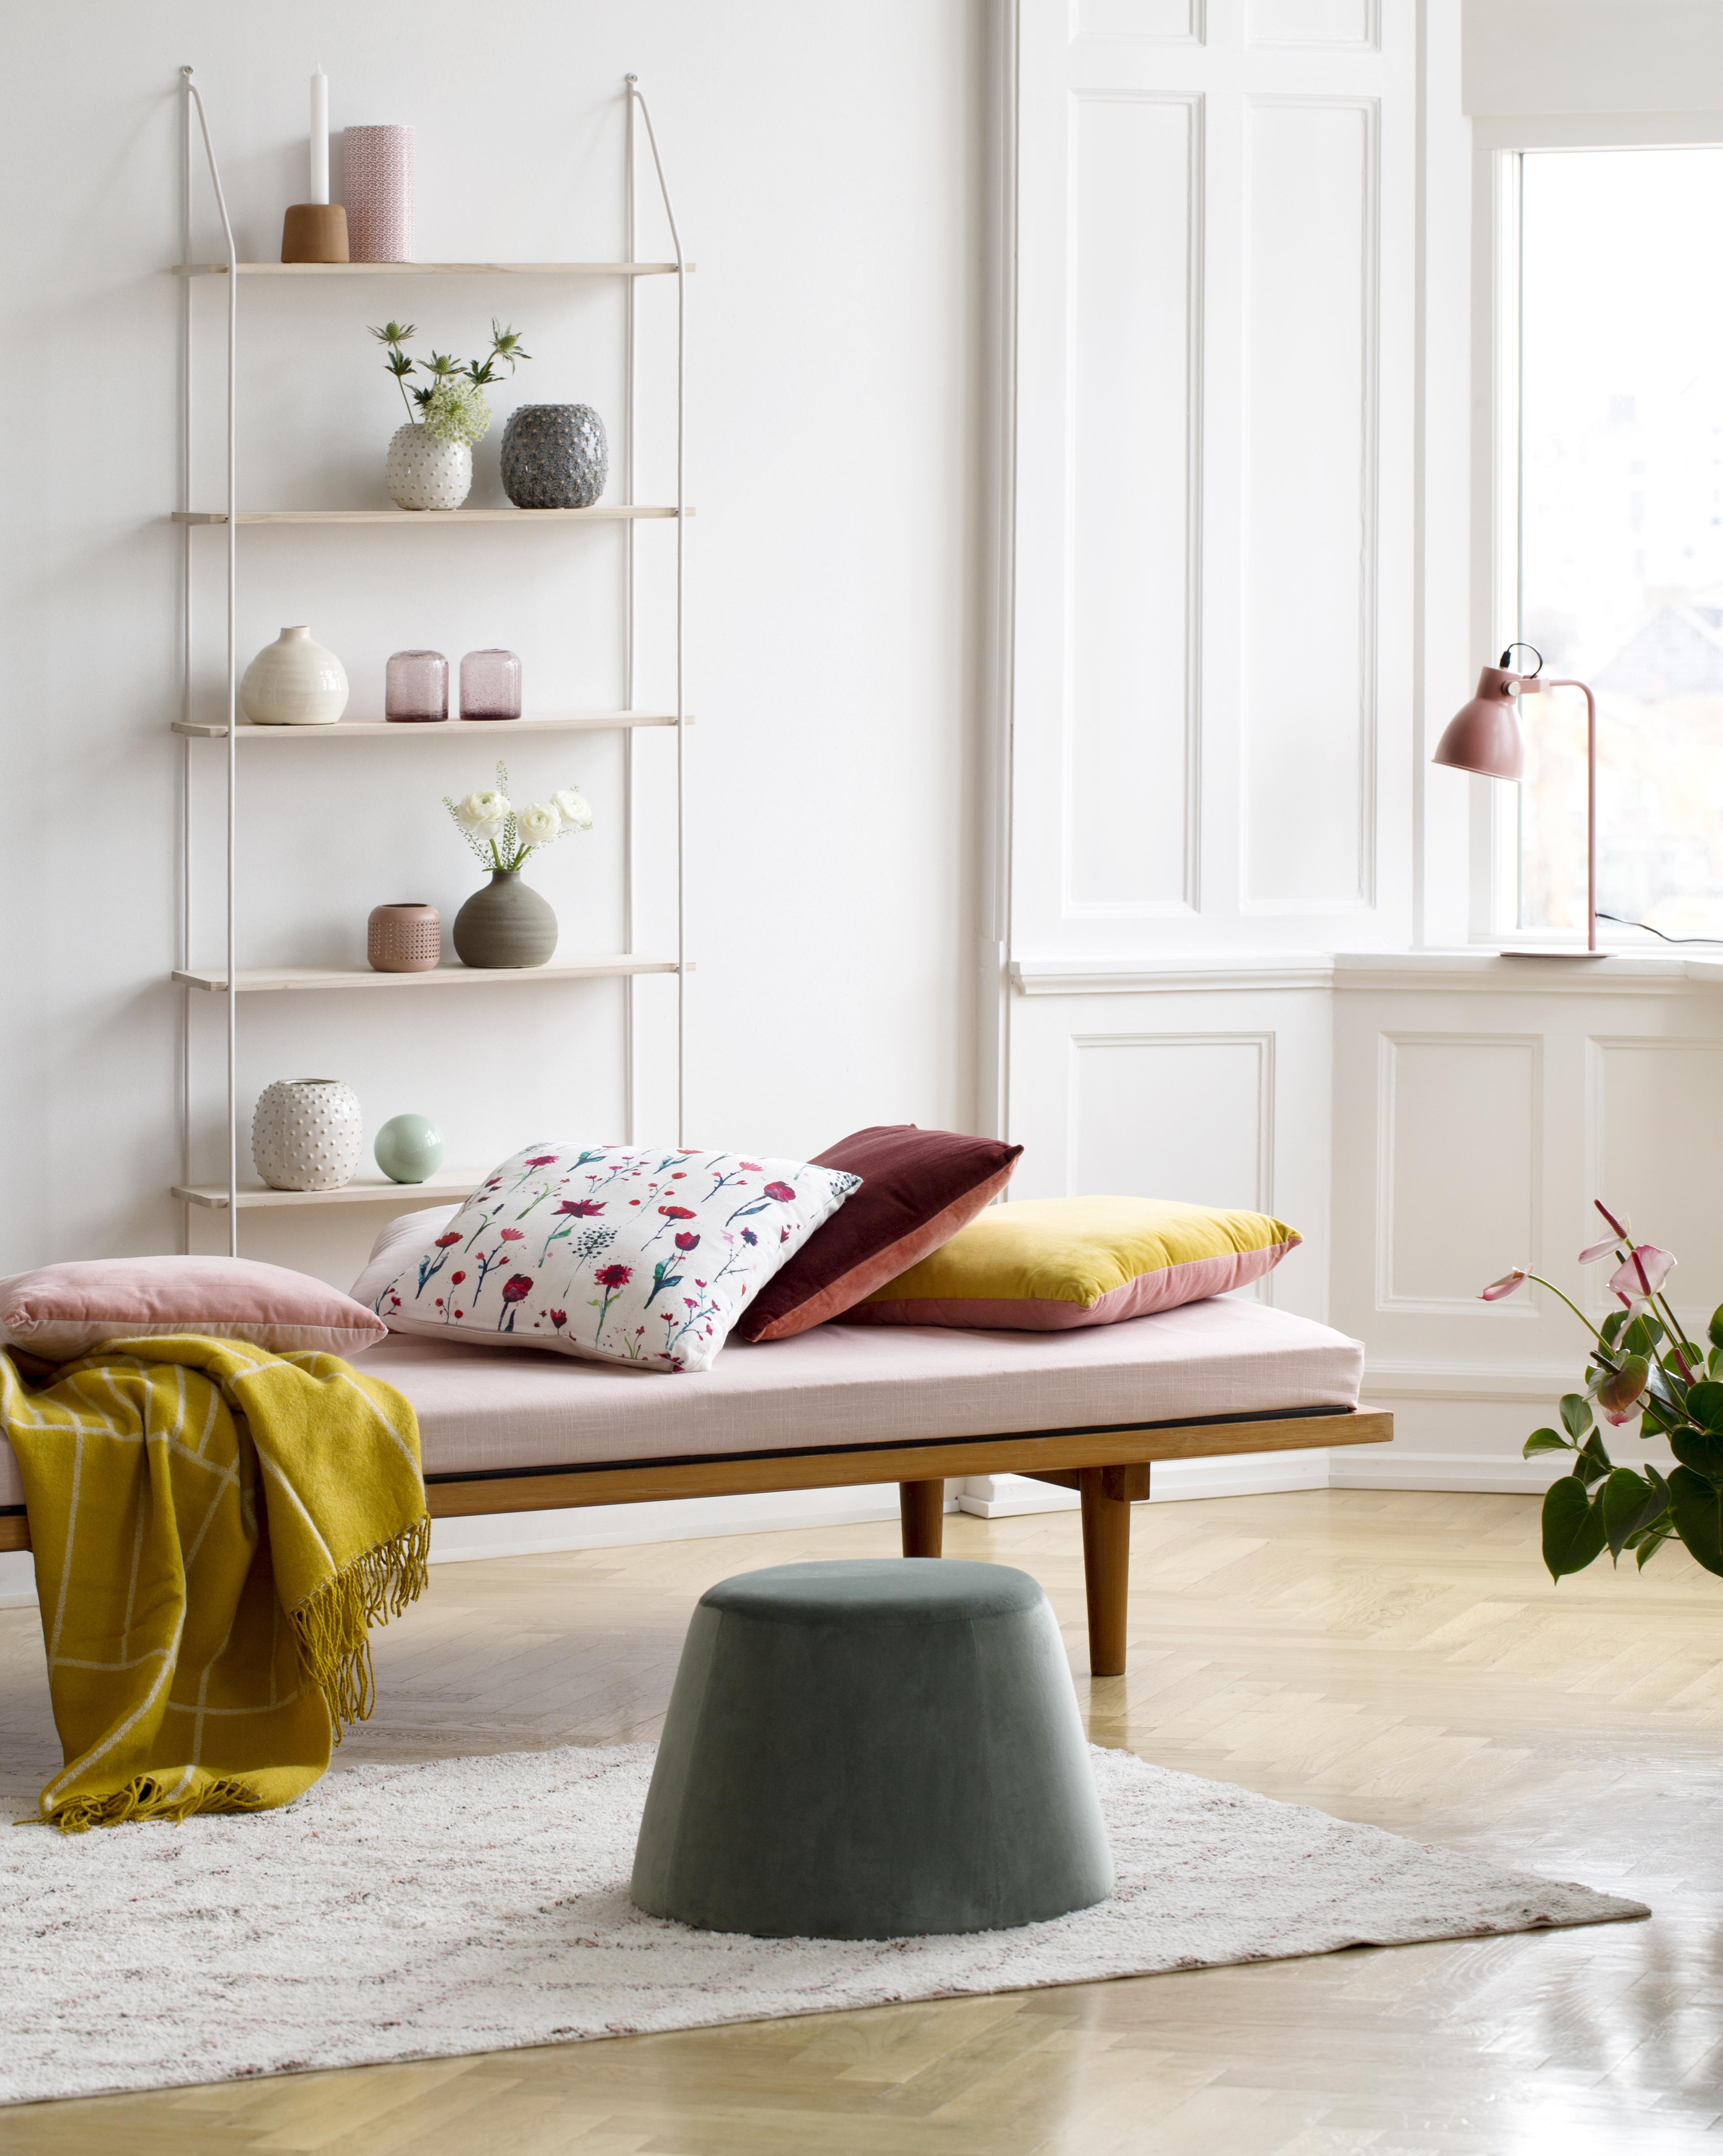 inspiration nouvelle maison 1 nouvelle collection sostrene grene la reine de l 39 iode. Black Bedroom Furniture Sets. Home Design Ideas